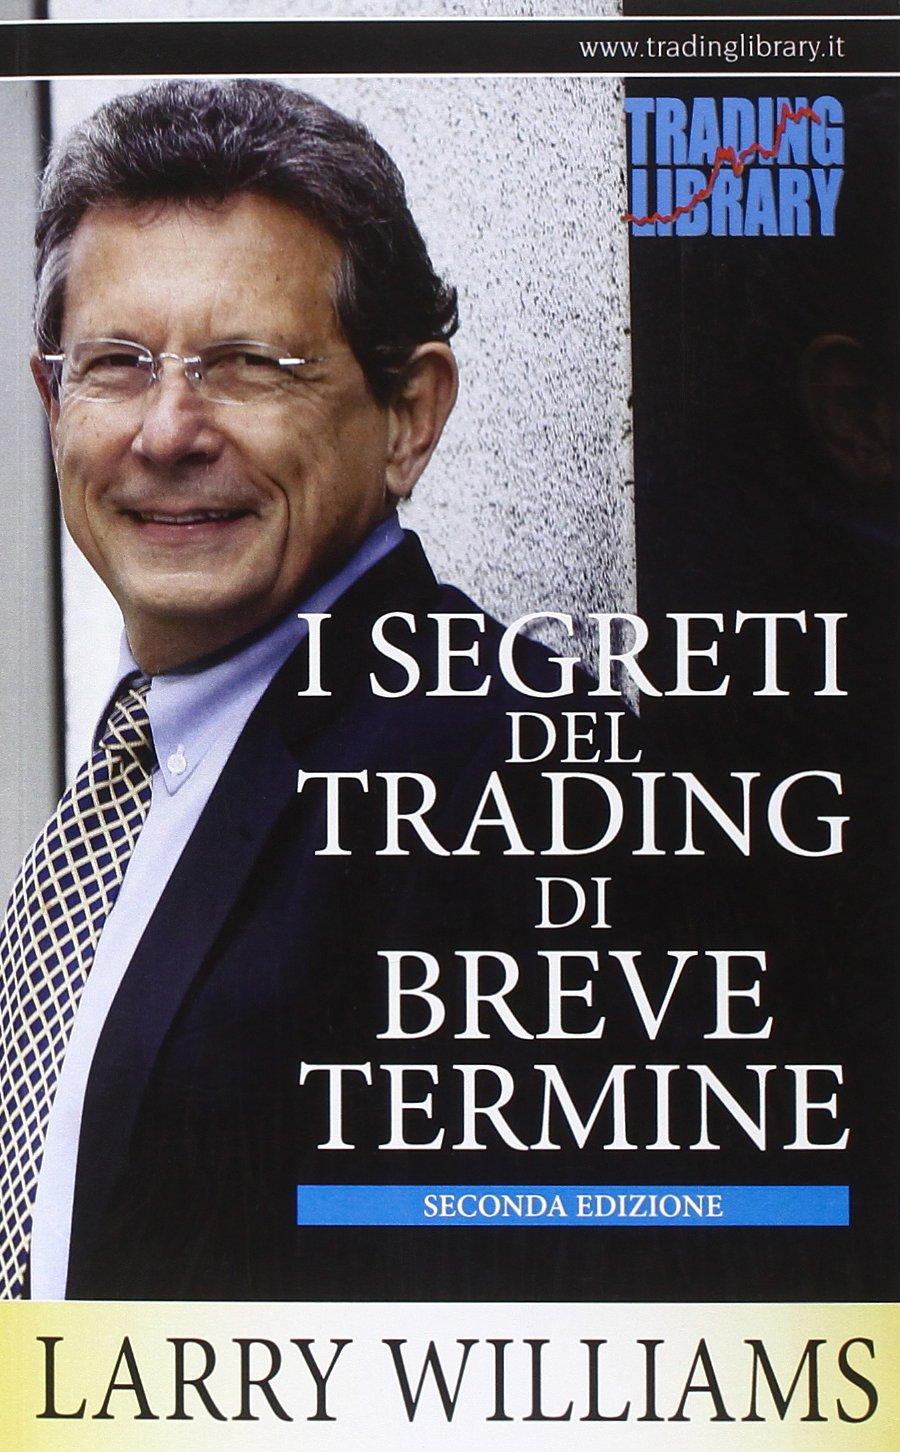 i segreti del trading di breve termine btc miner telegram como retirar